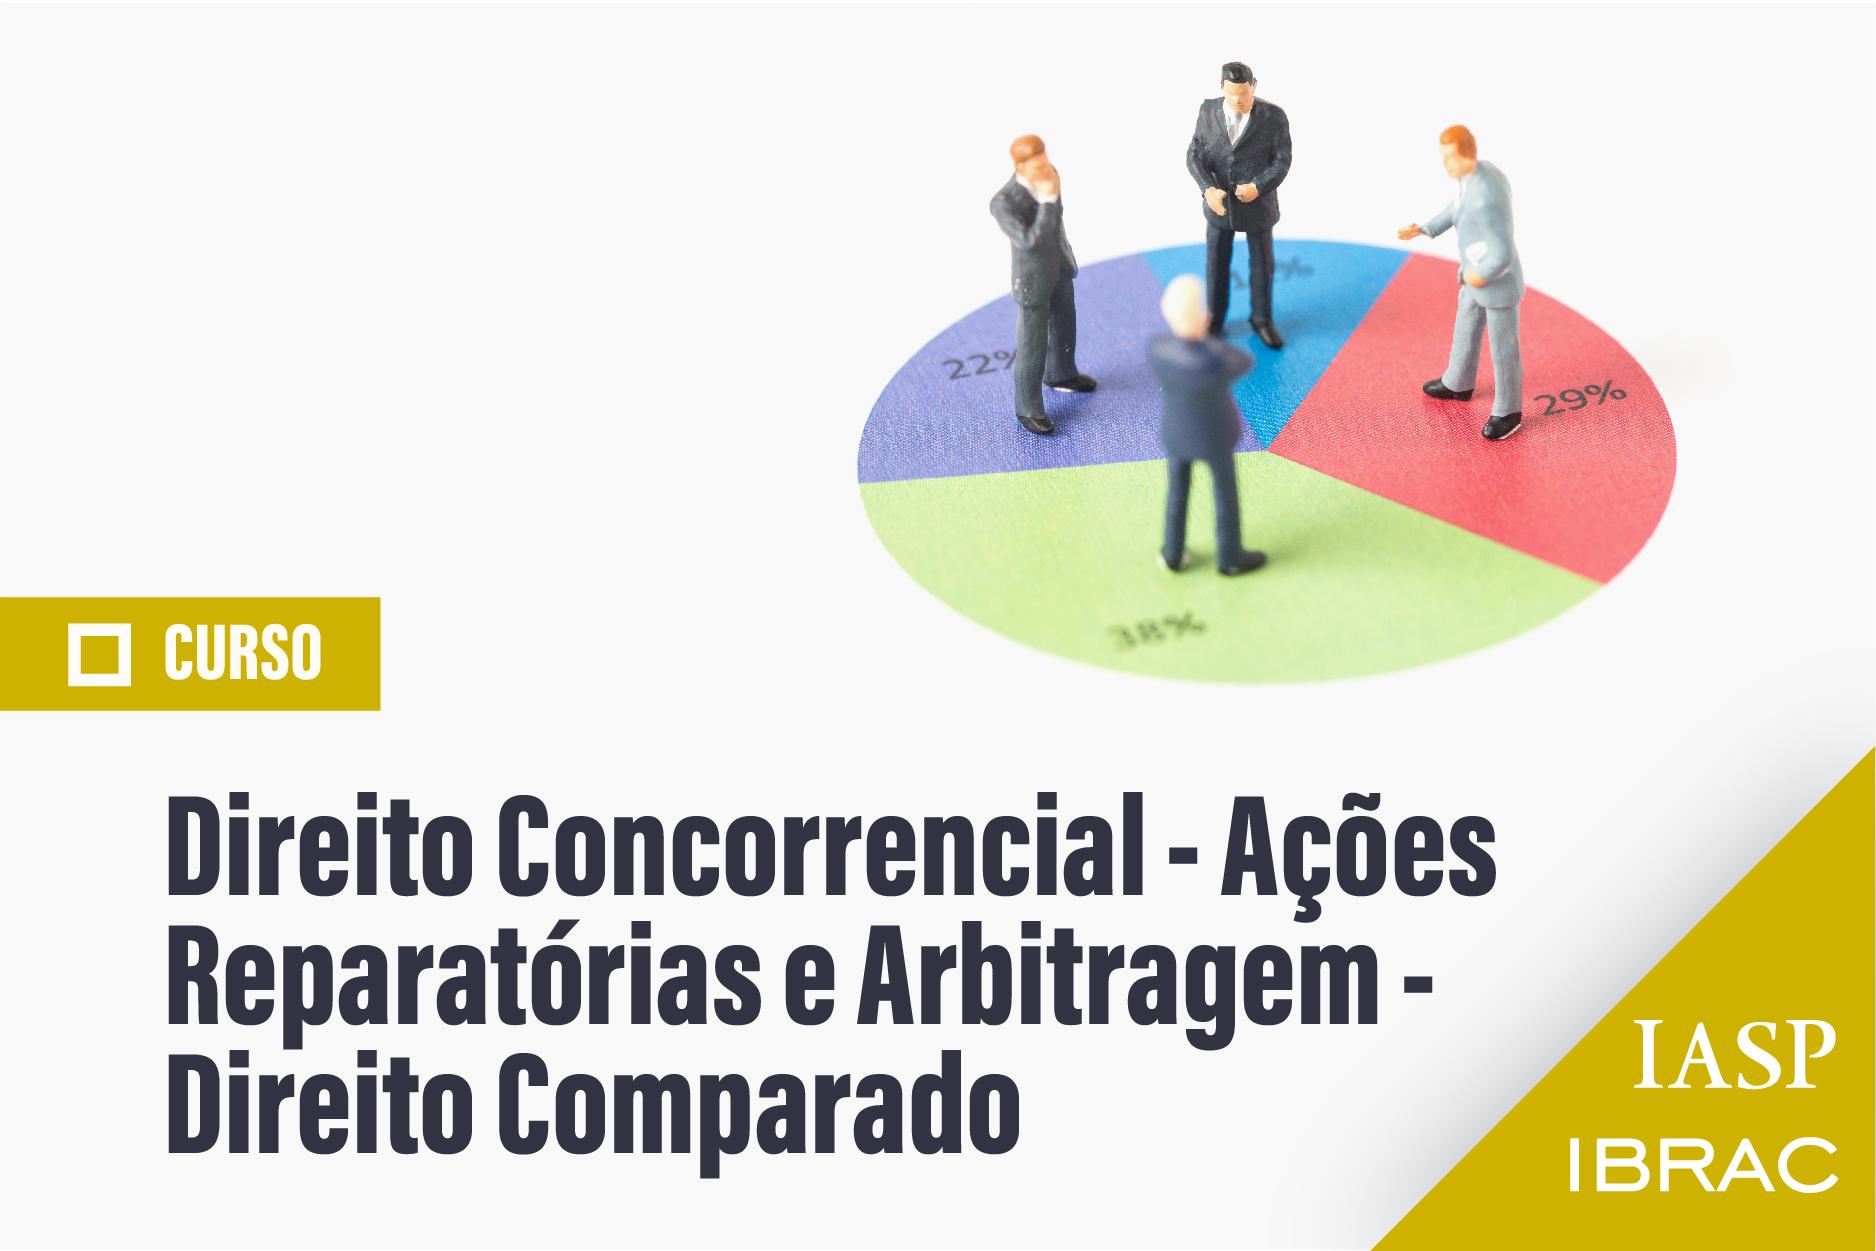 IASP_CURSO_ACOESREPARATORIAS-01.jpg